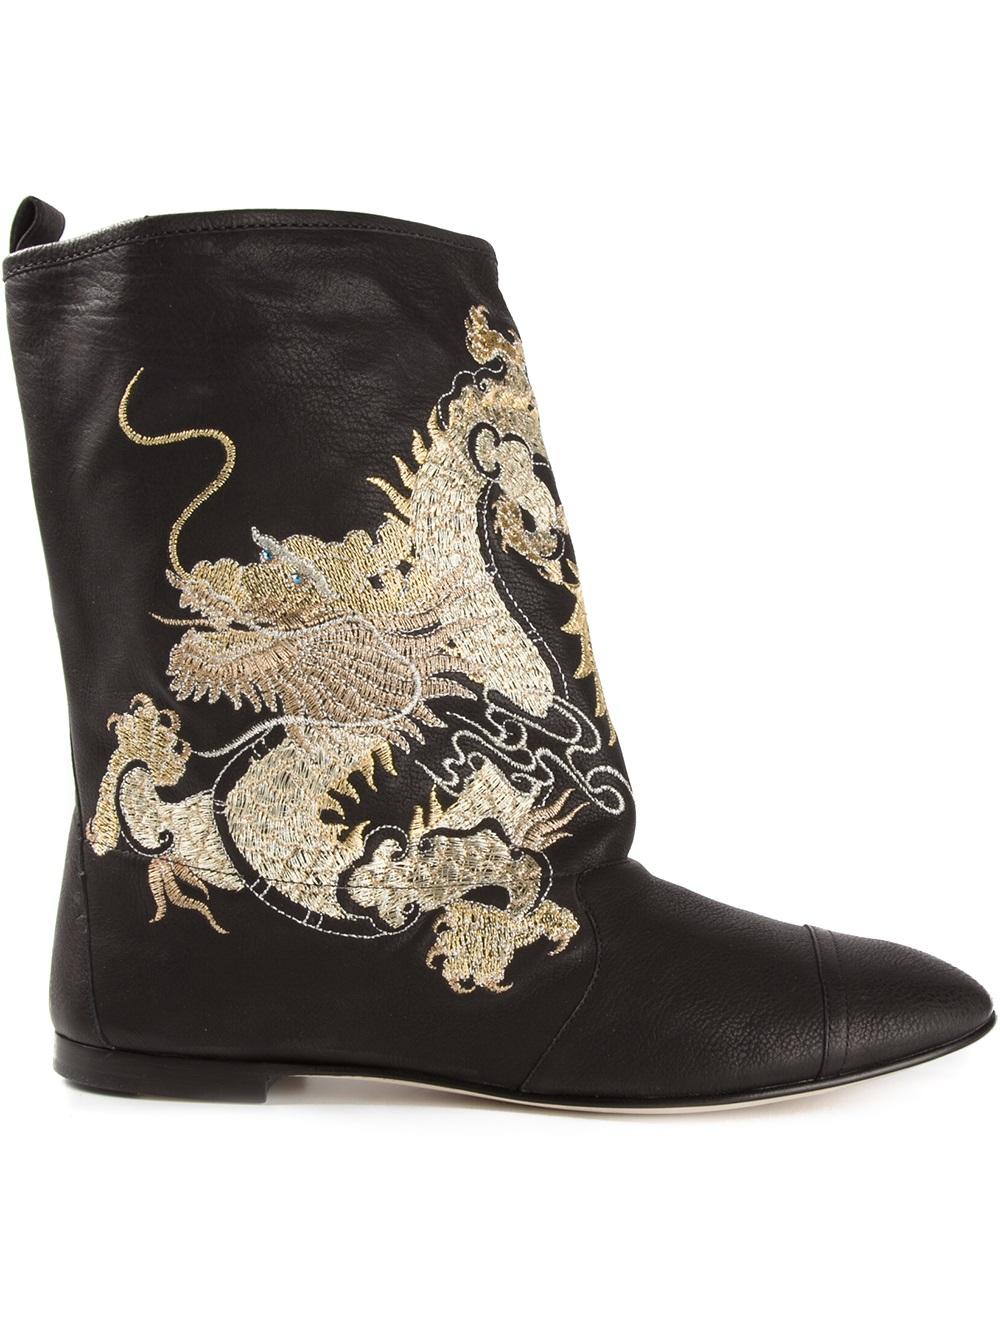 Giuseppe Zanotti Dragon Embroidered Boots In Metallic Lyst